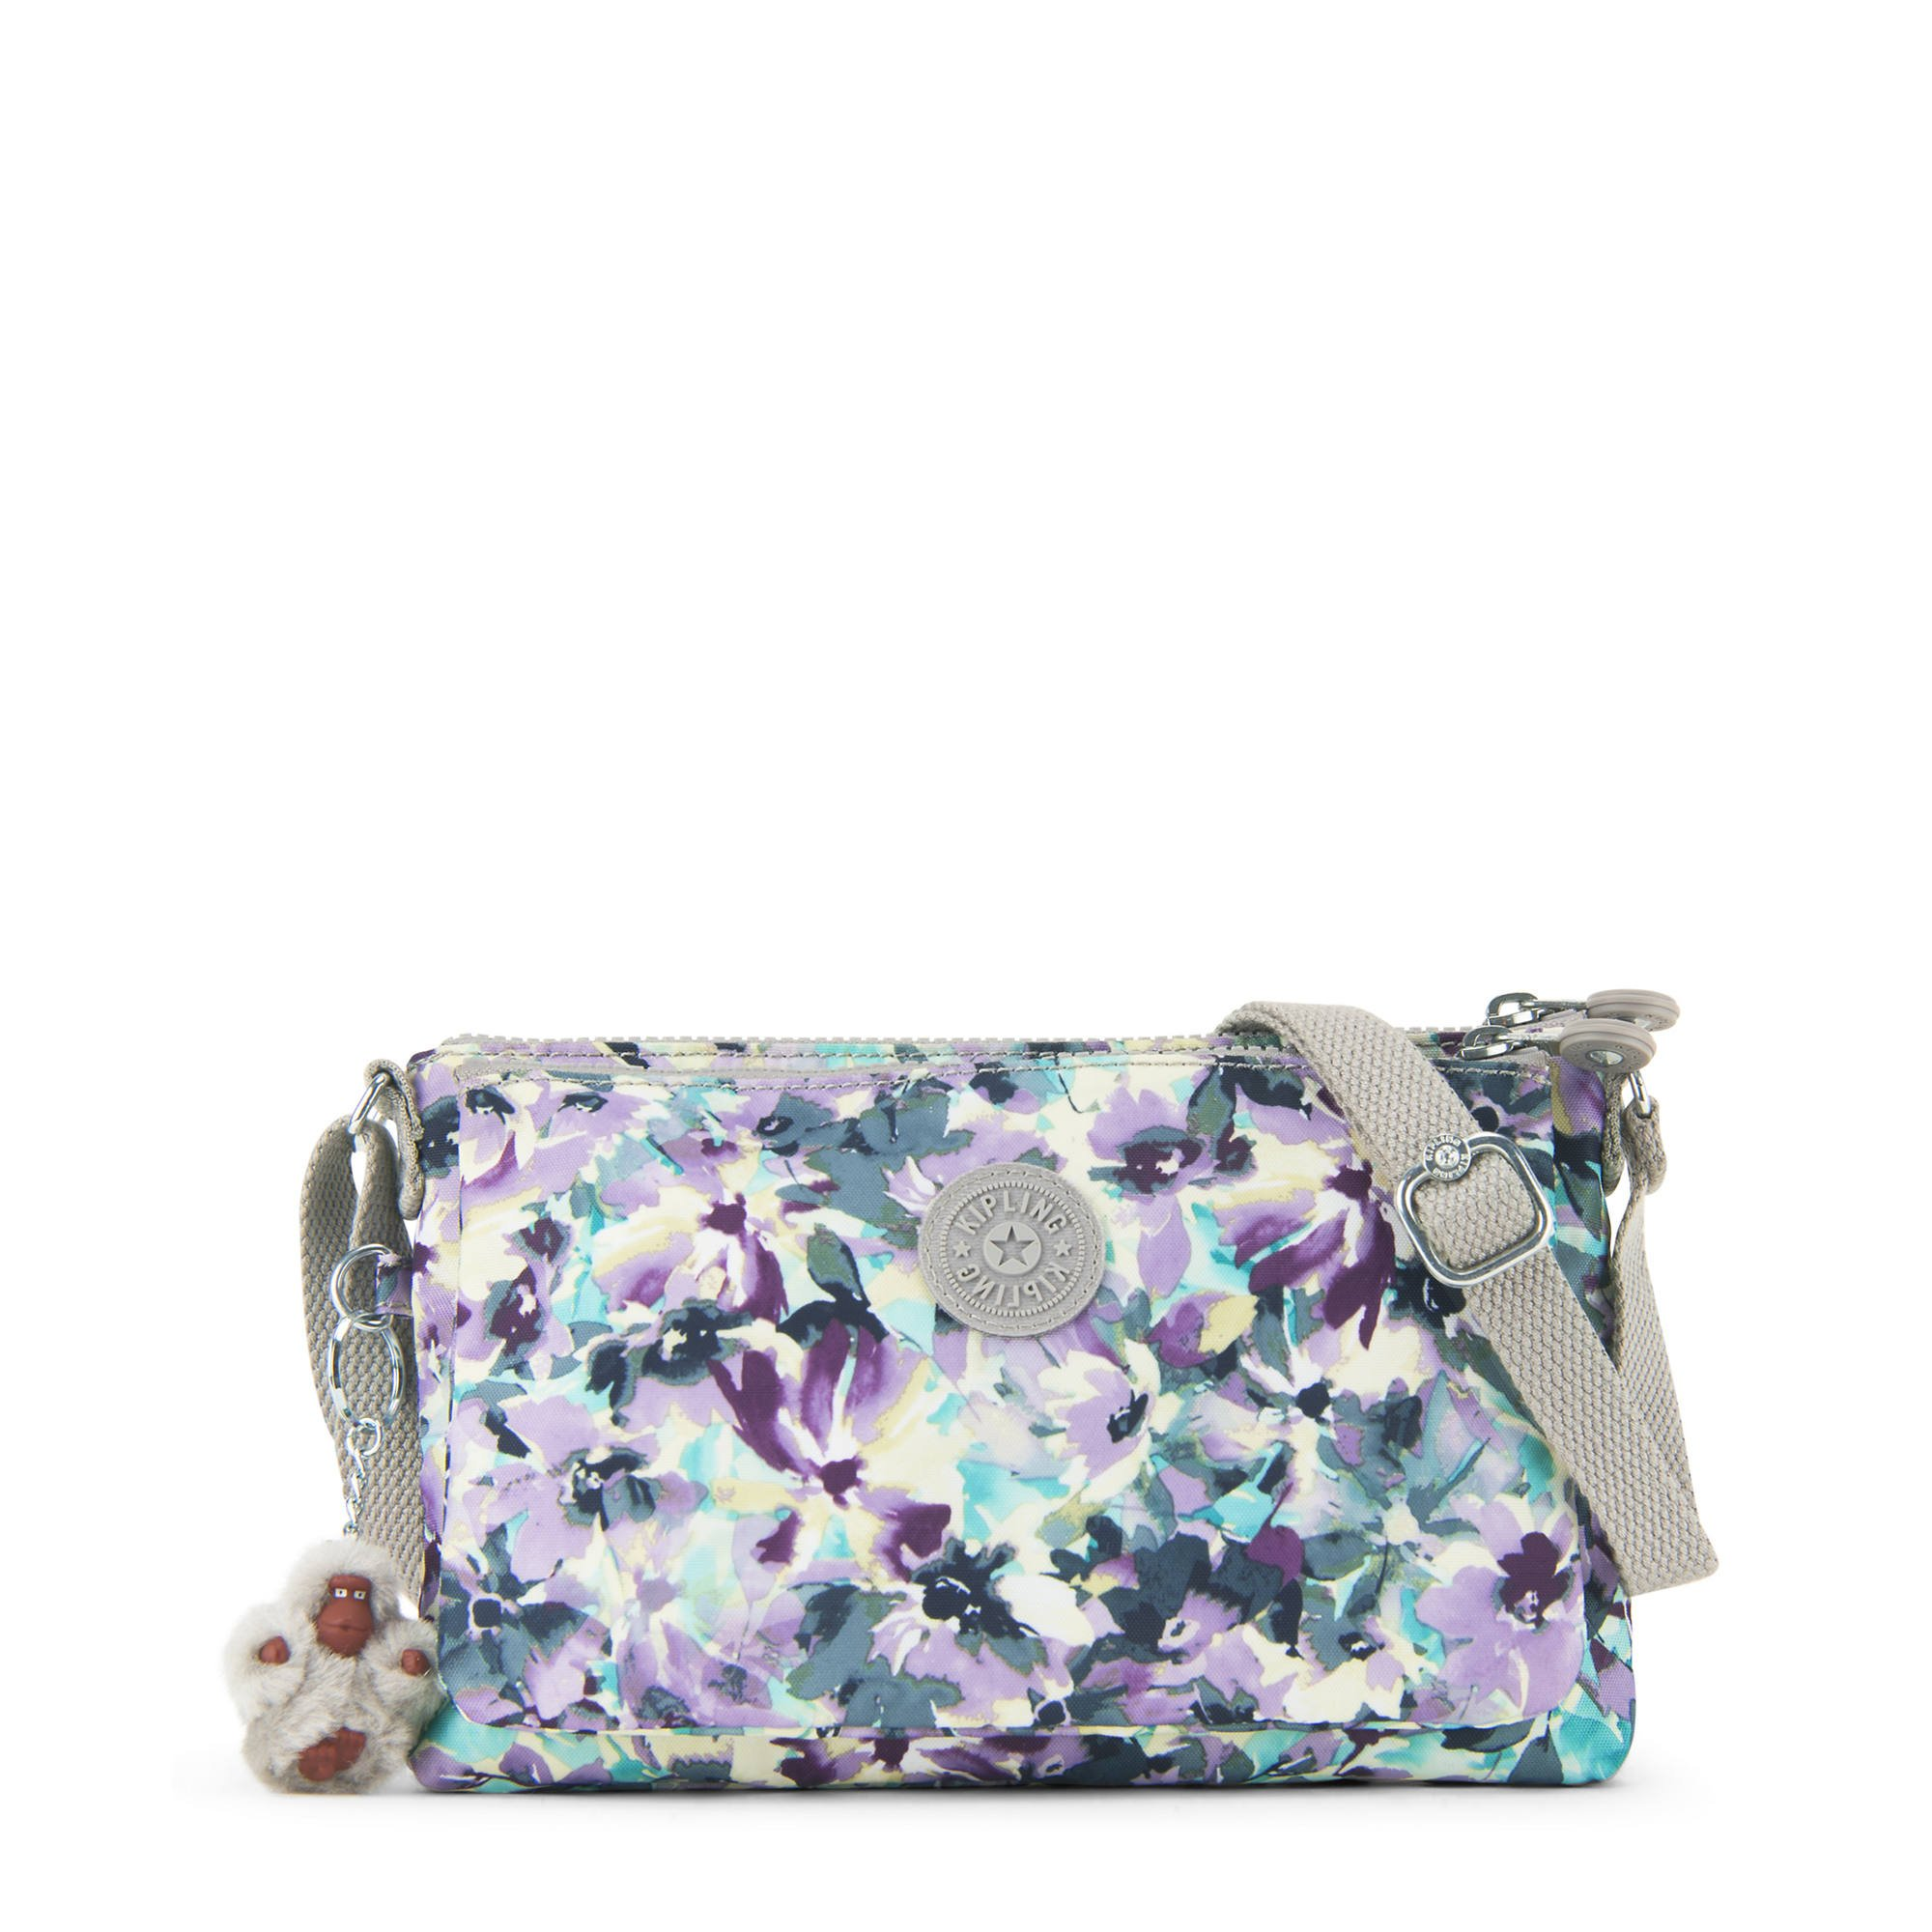 Kipling Women's Mikaela Printed Crossbody Bag One Size Spanish Bloom by Kipling